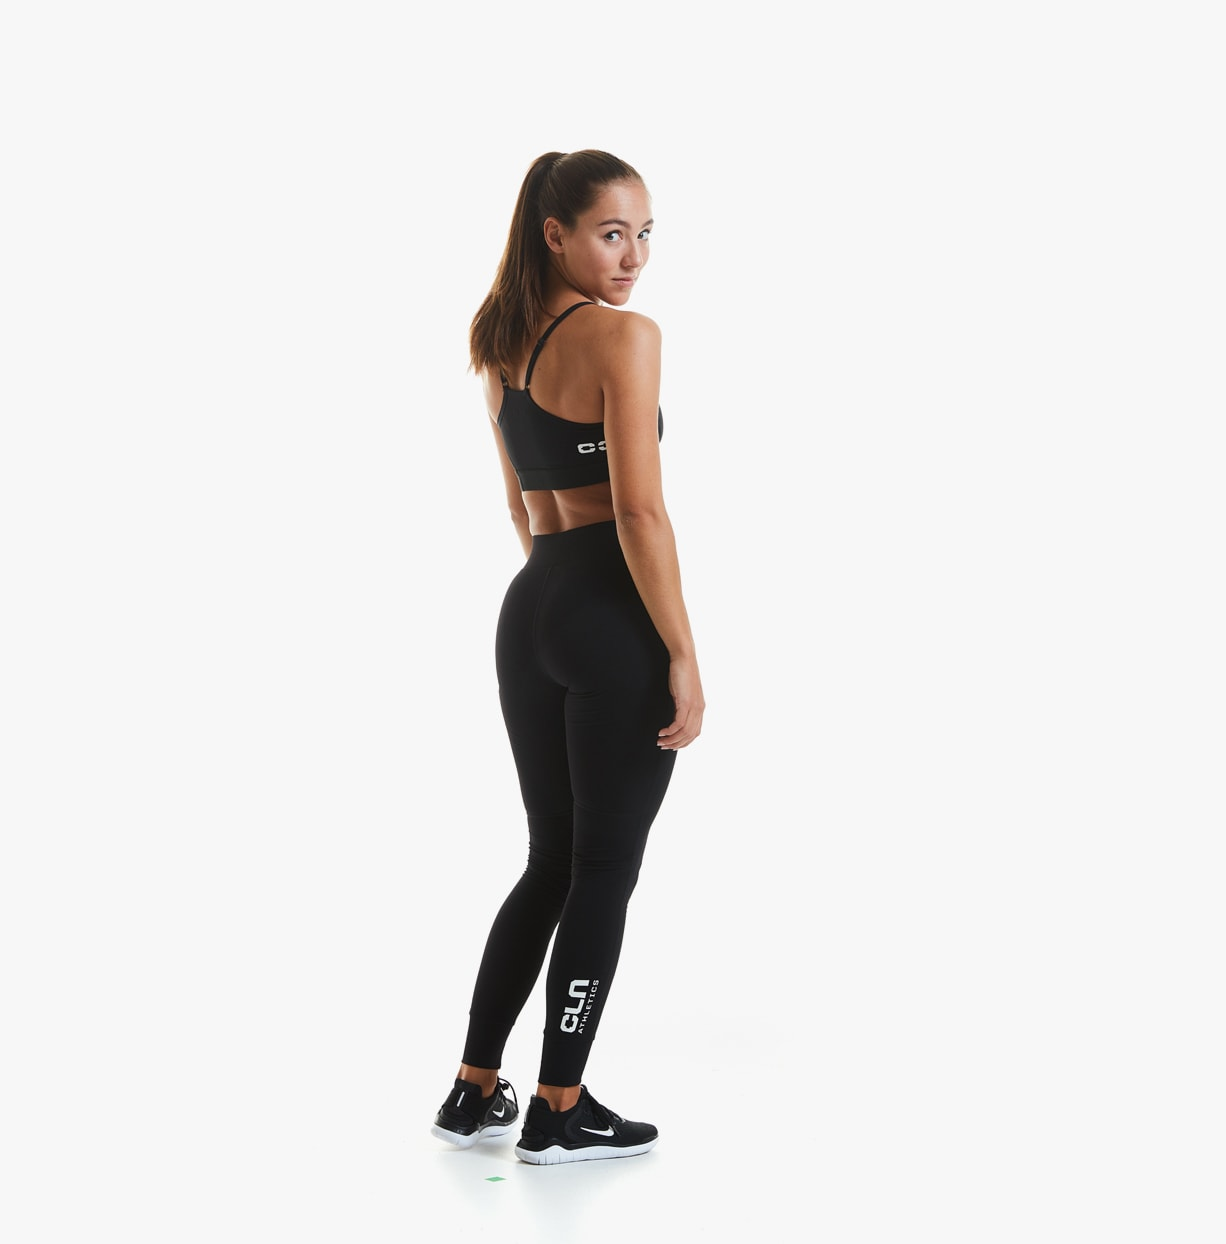 cln-liza-sports-bra-black-3